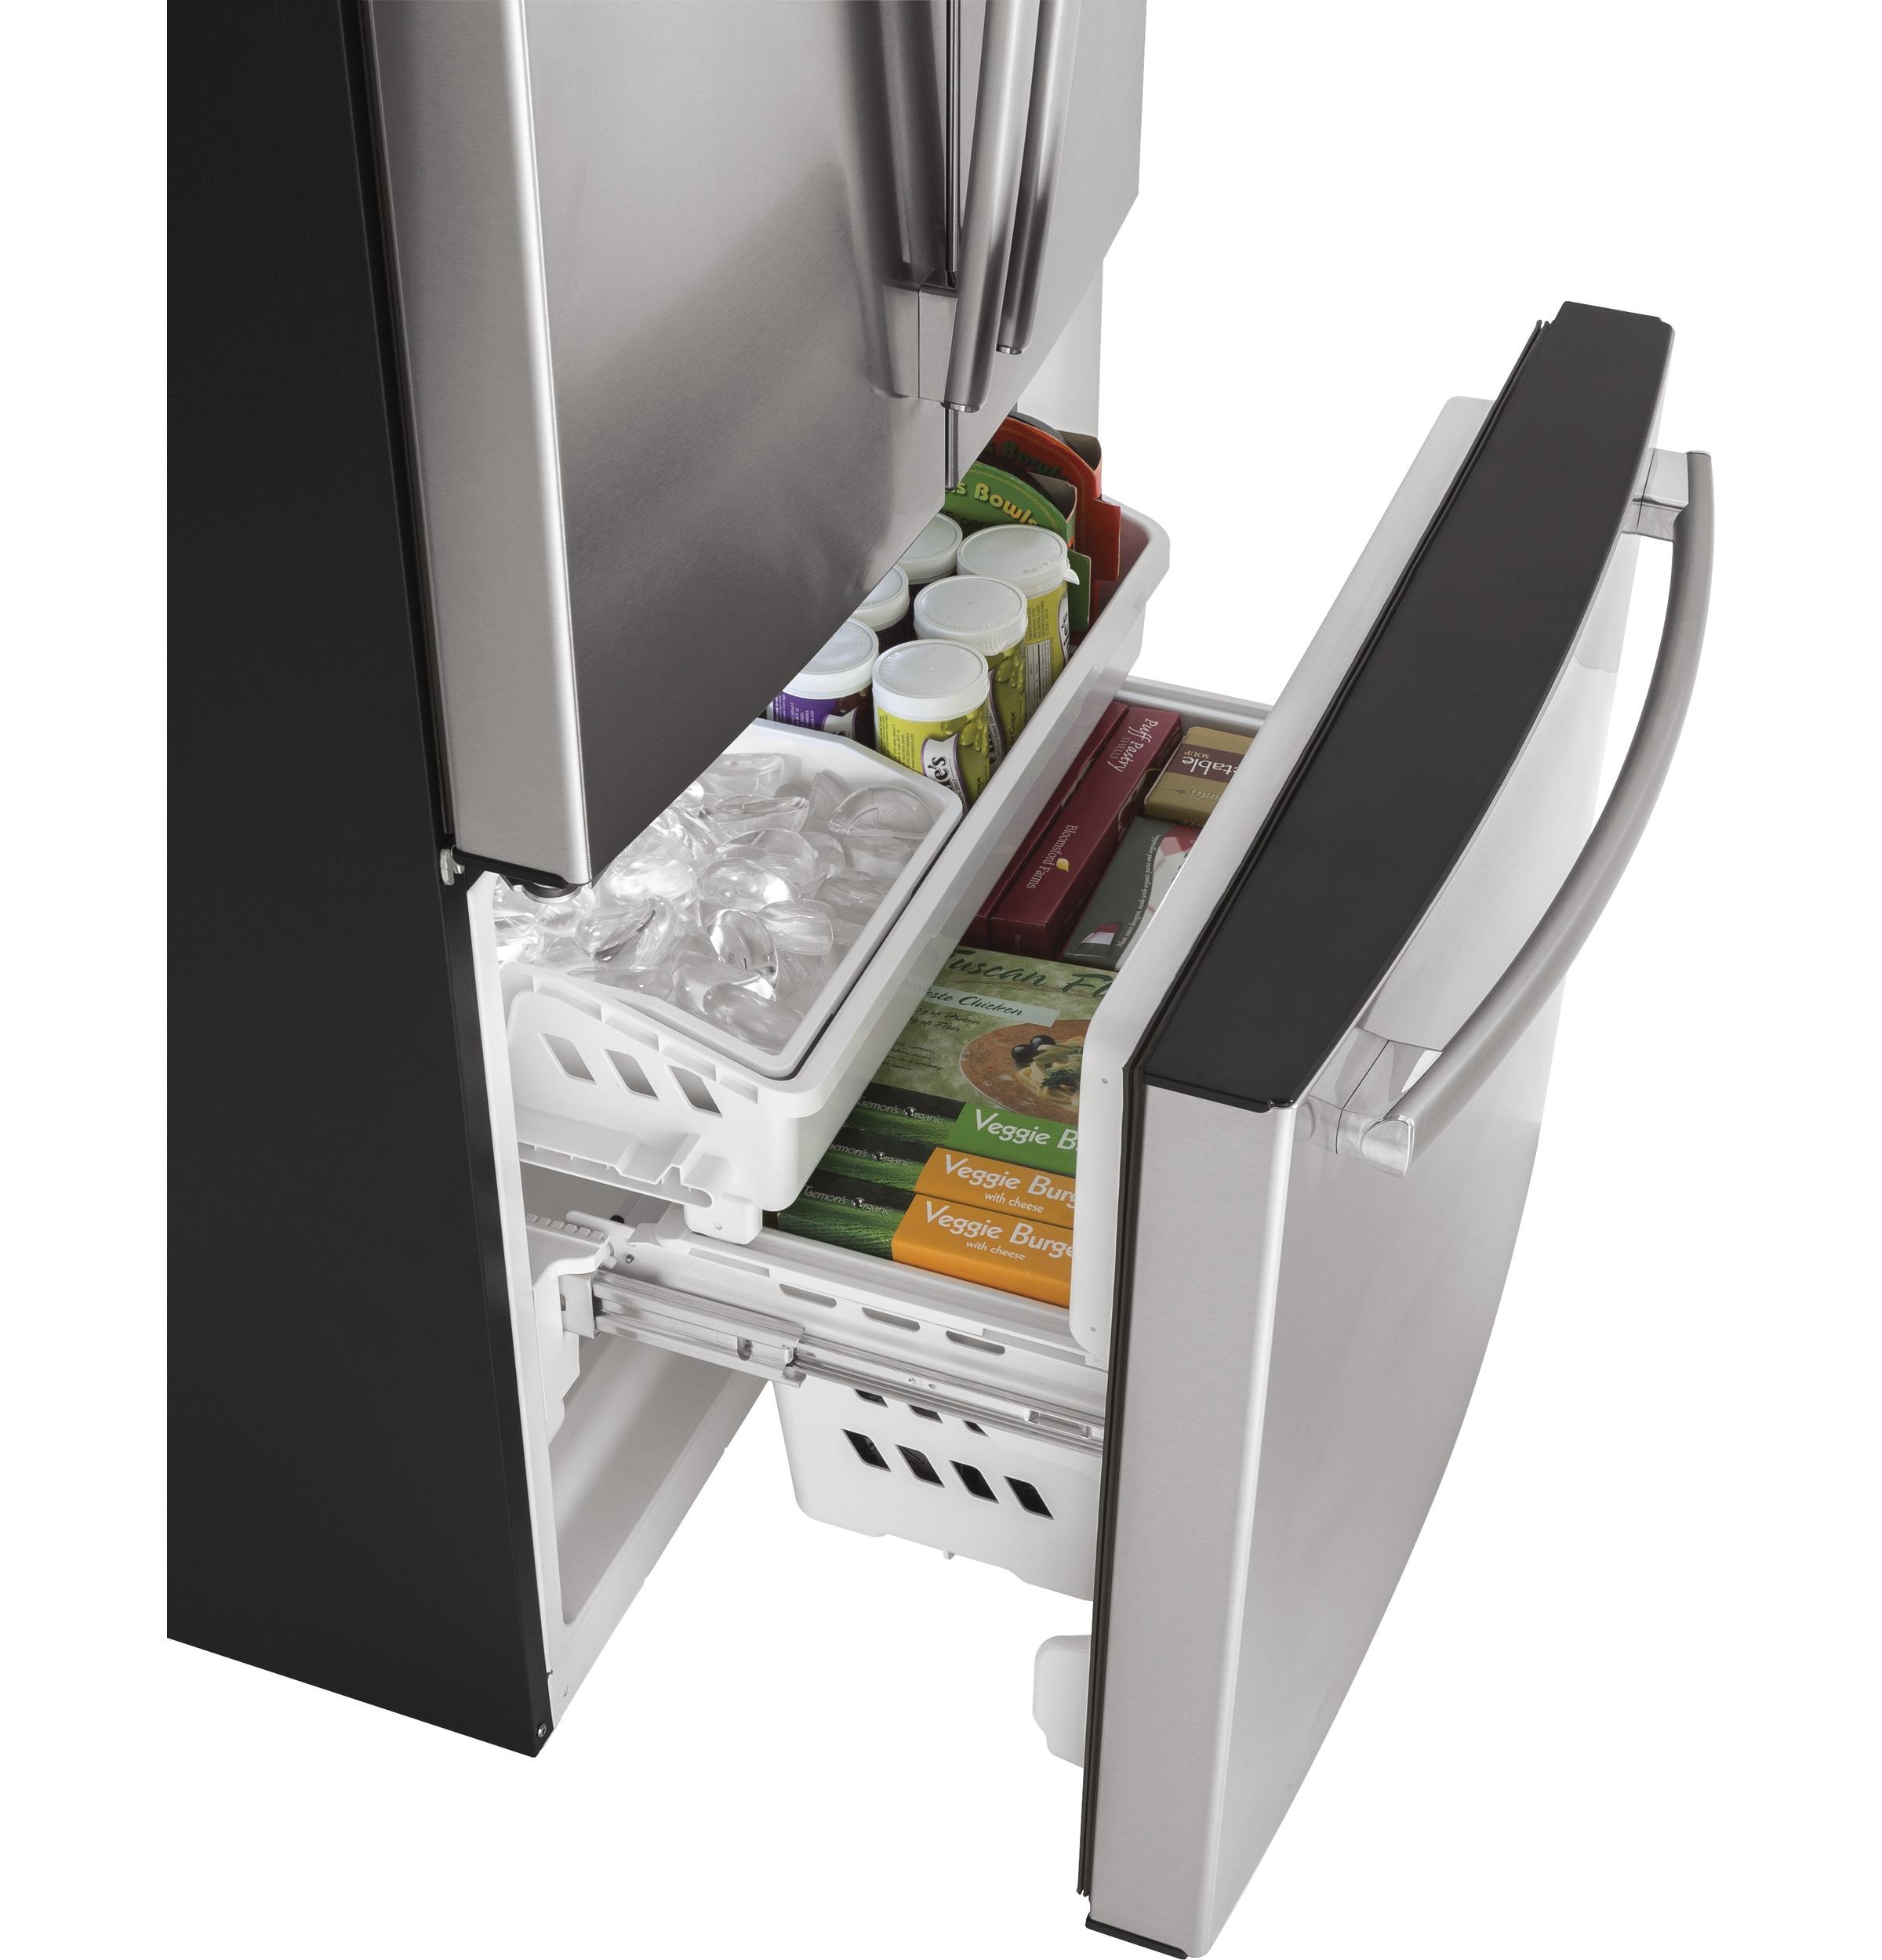 Model: GYE18JSLSS | GE® ENERGY STAR® 17.5 Cu. Ft. Counter-Depth French-Door Refrigerator